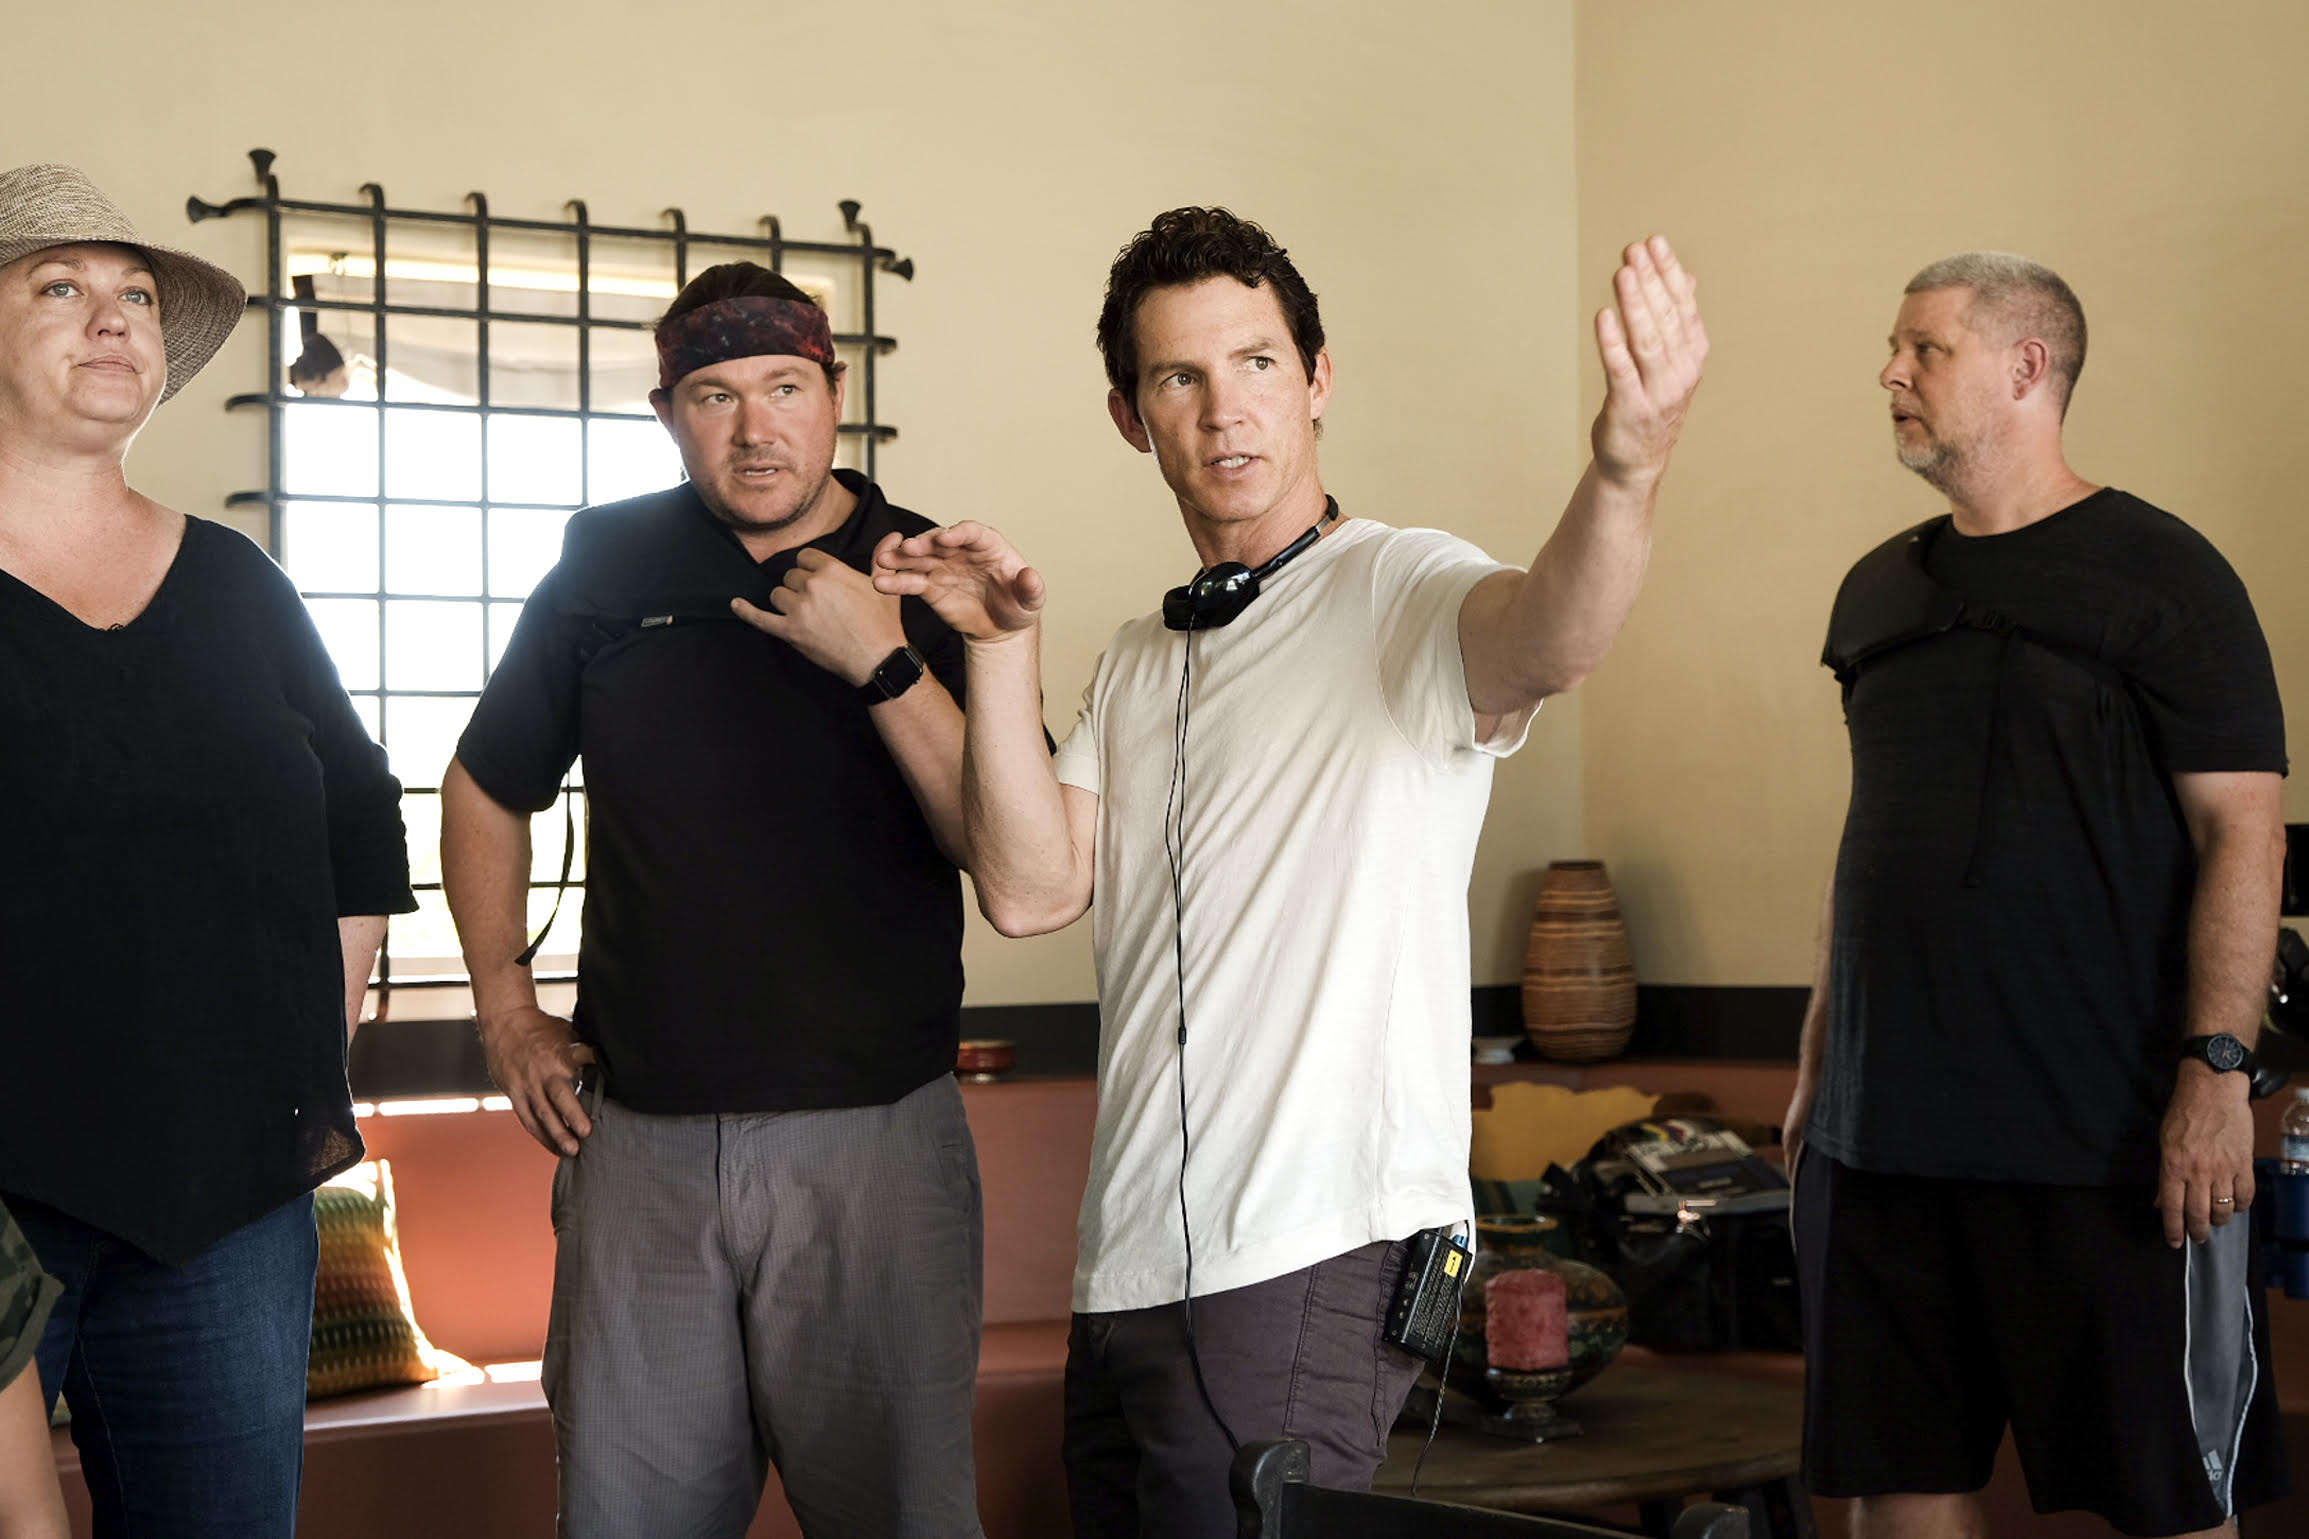 Shawn Hatosy directing Season 3 Episode 311 Animal Kingdom.